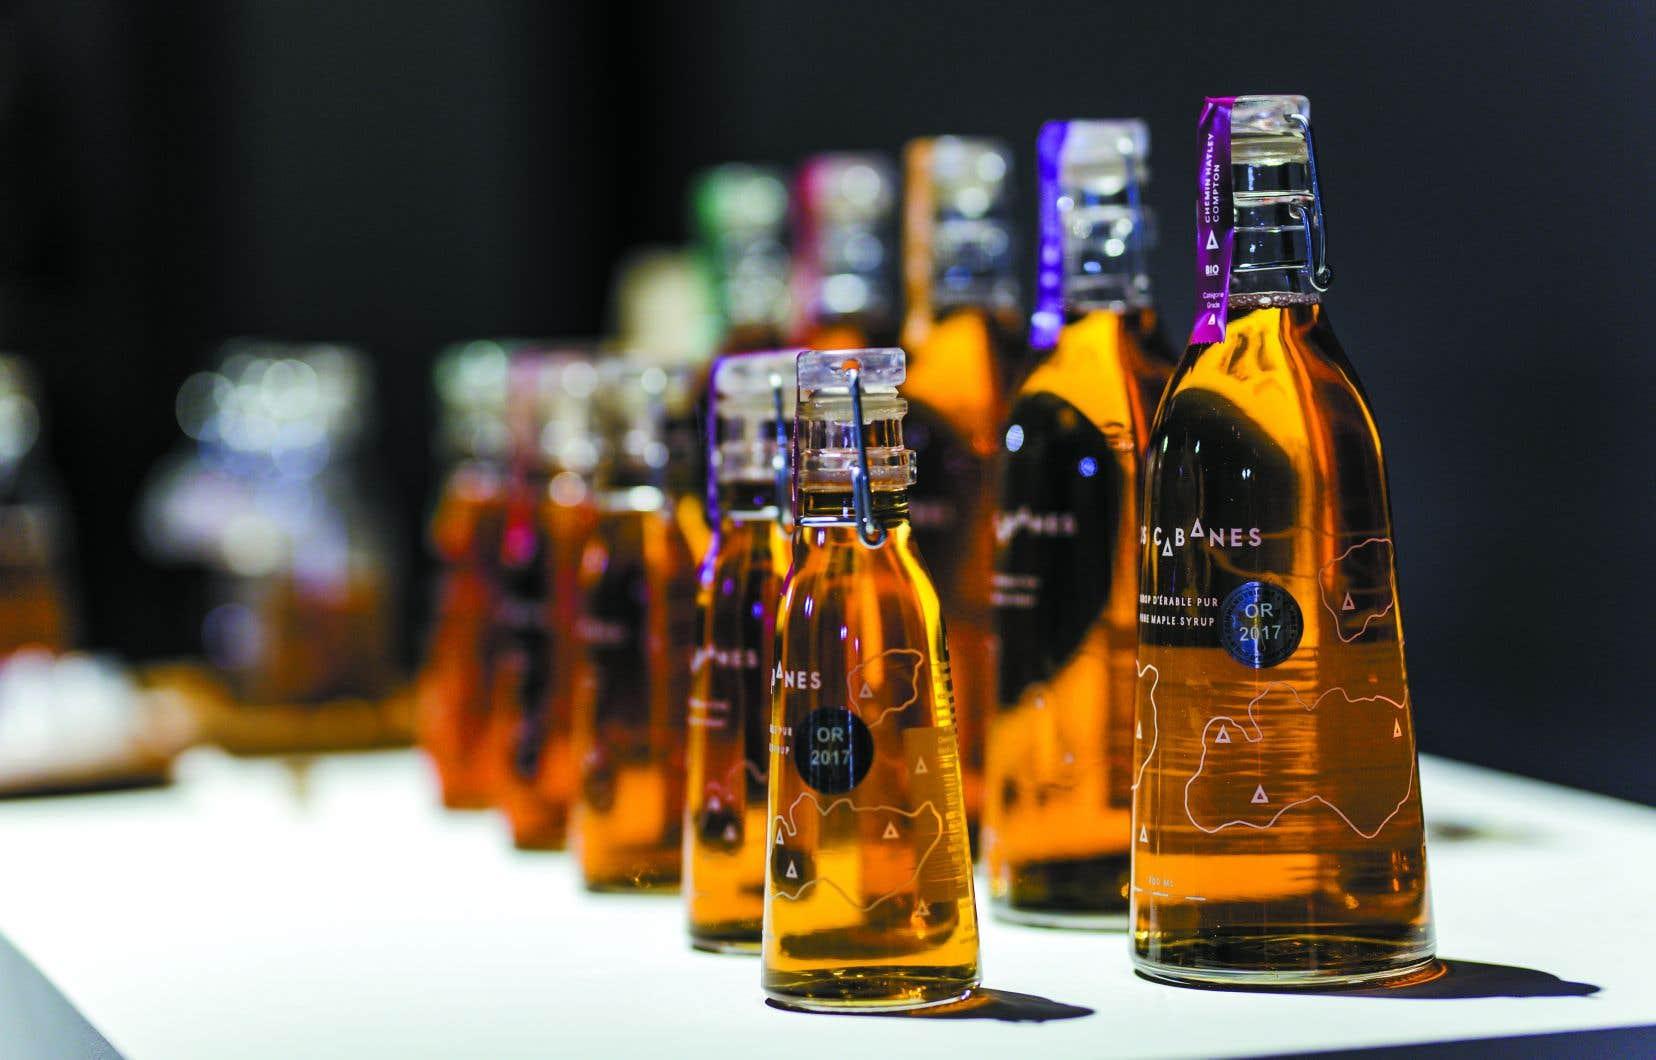 Les bouteilles de sirops de Nos Cabanes